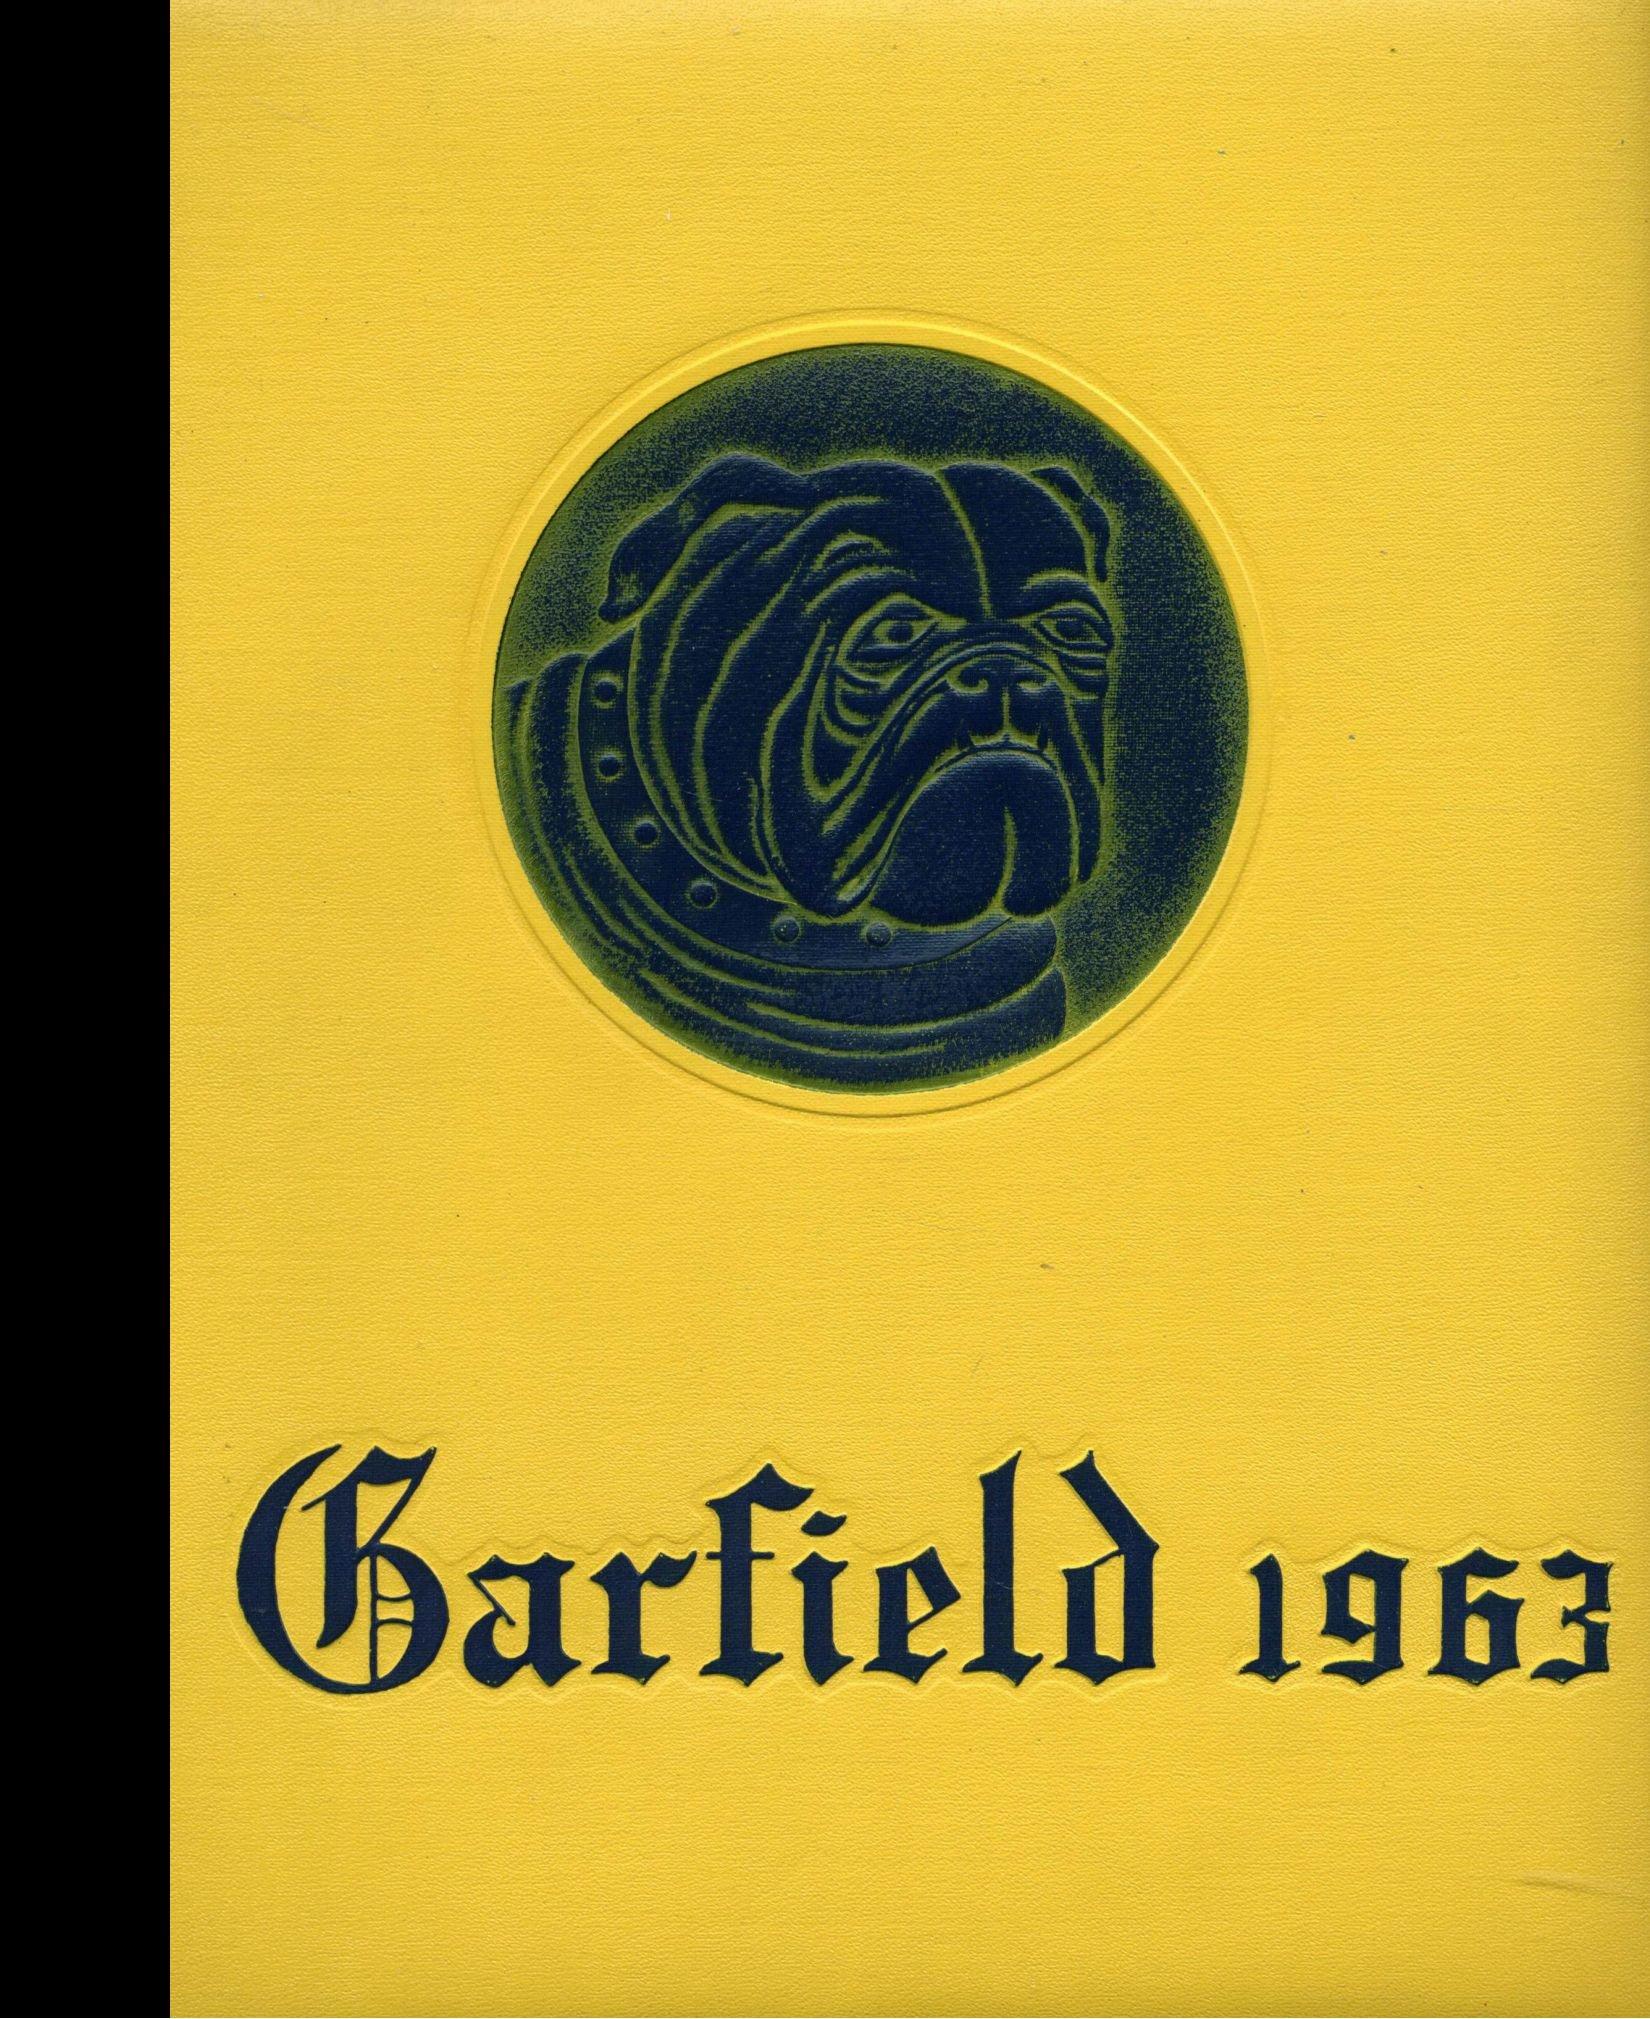 Reprint 1963 Yearbook Garfield Heights High School Garfield Heights Ohio Yearbook Staff Garfield Heights High School 1963 Amazon Com Books